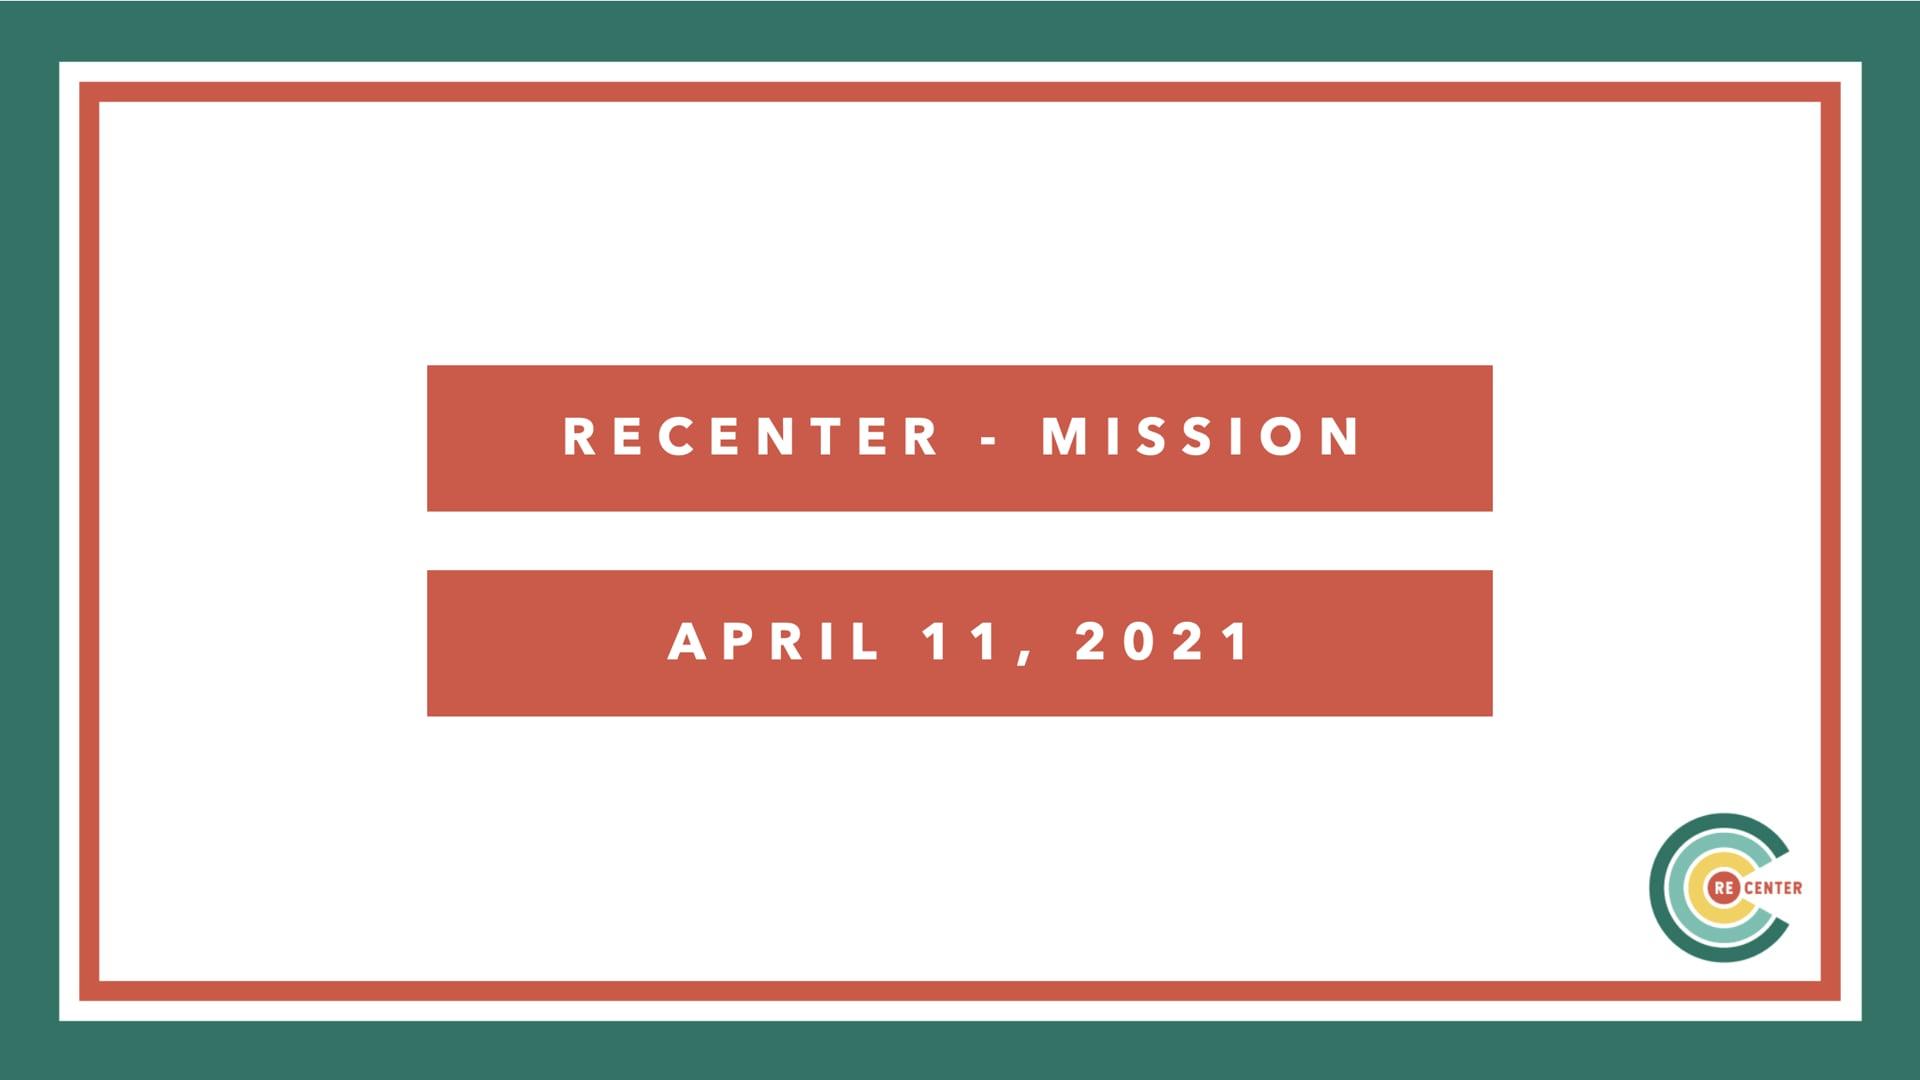 RECENTER - Mission